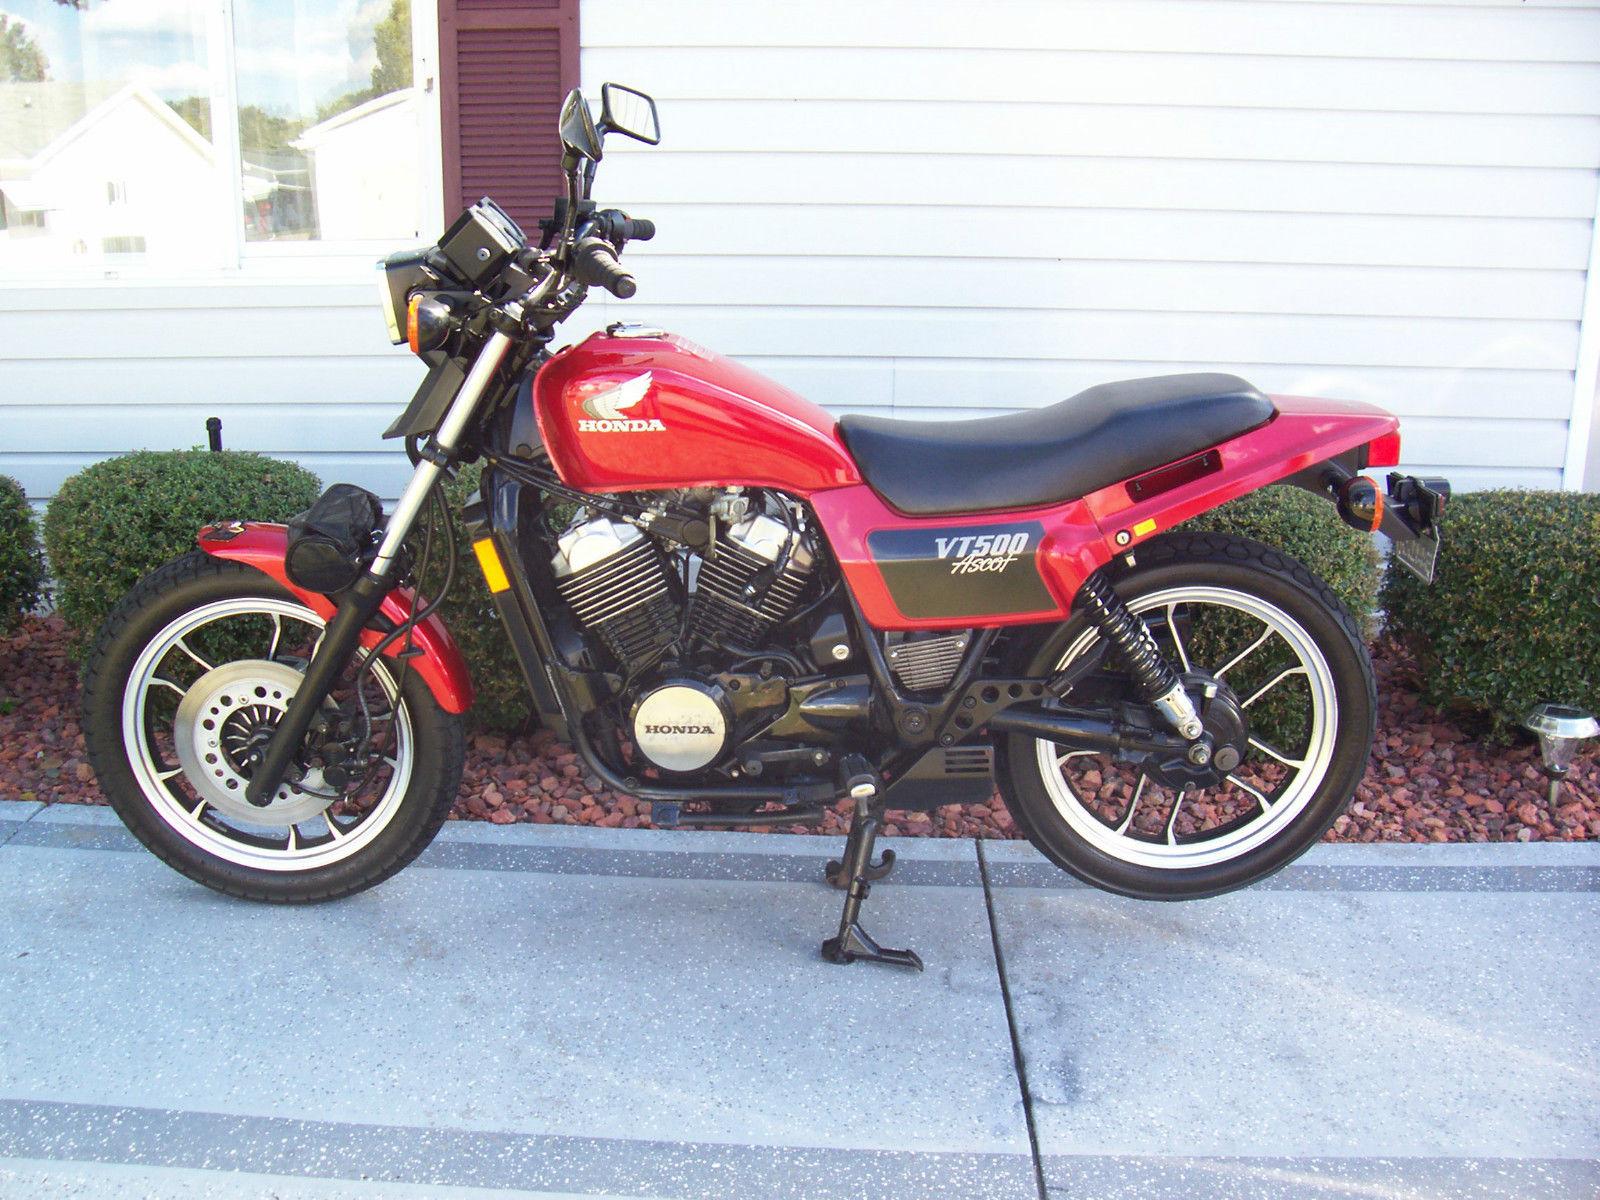 Honda Vt500 Ascot Wiring Diagram Electrical Diagrams Vt500c Motorcycle Schematic Basic Guide Bikes